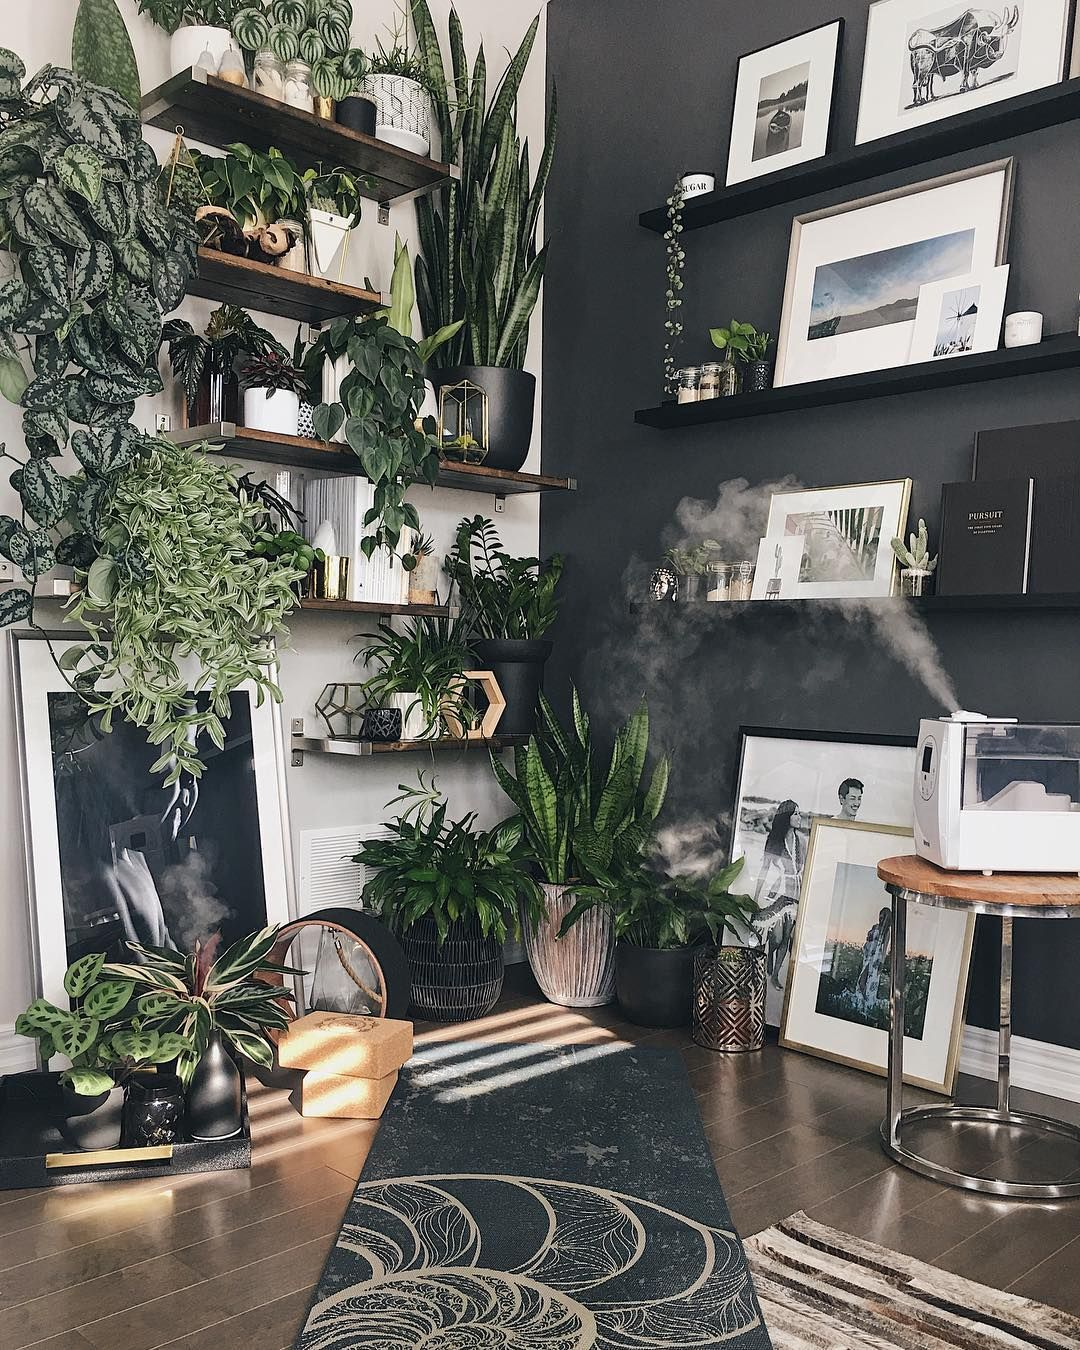 Mel On Instagram The Perfect Little Meditation Yoga Corner Benefits To Adding Plants Home Yoga Room Meditation Room Diy Meditation Rooms